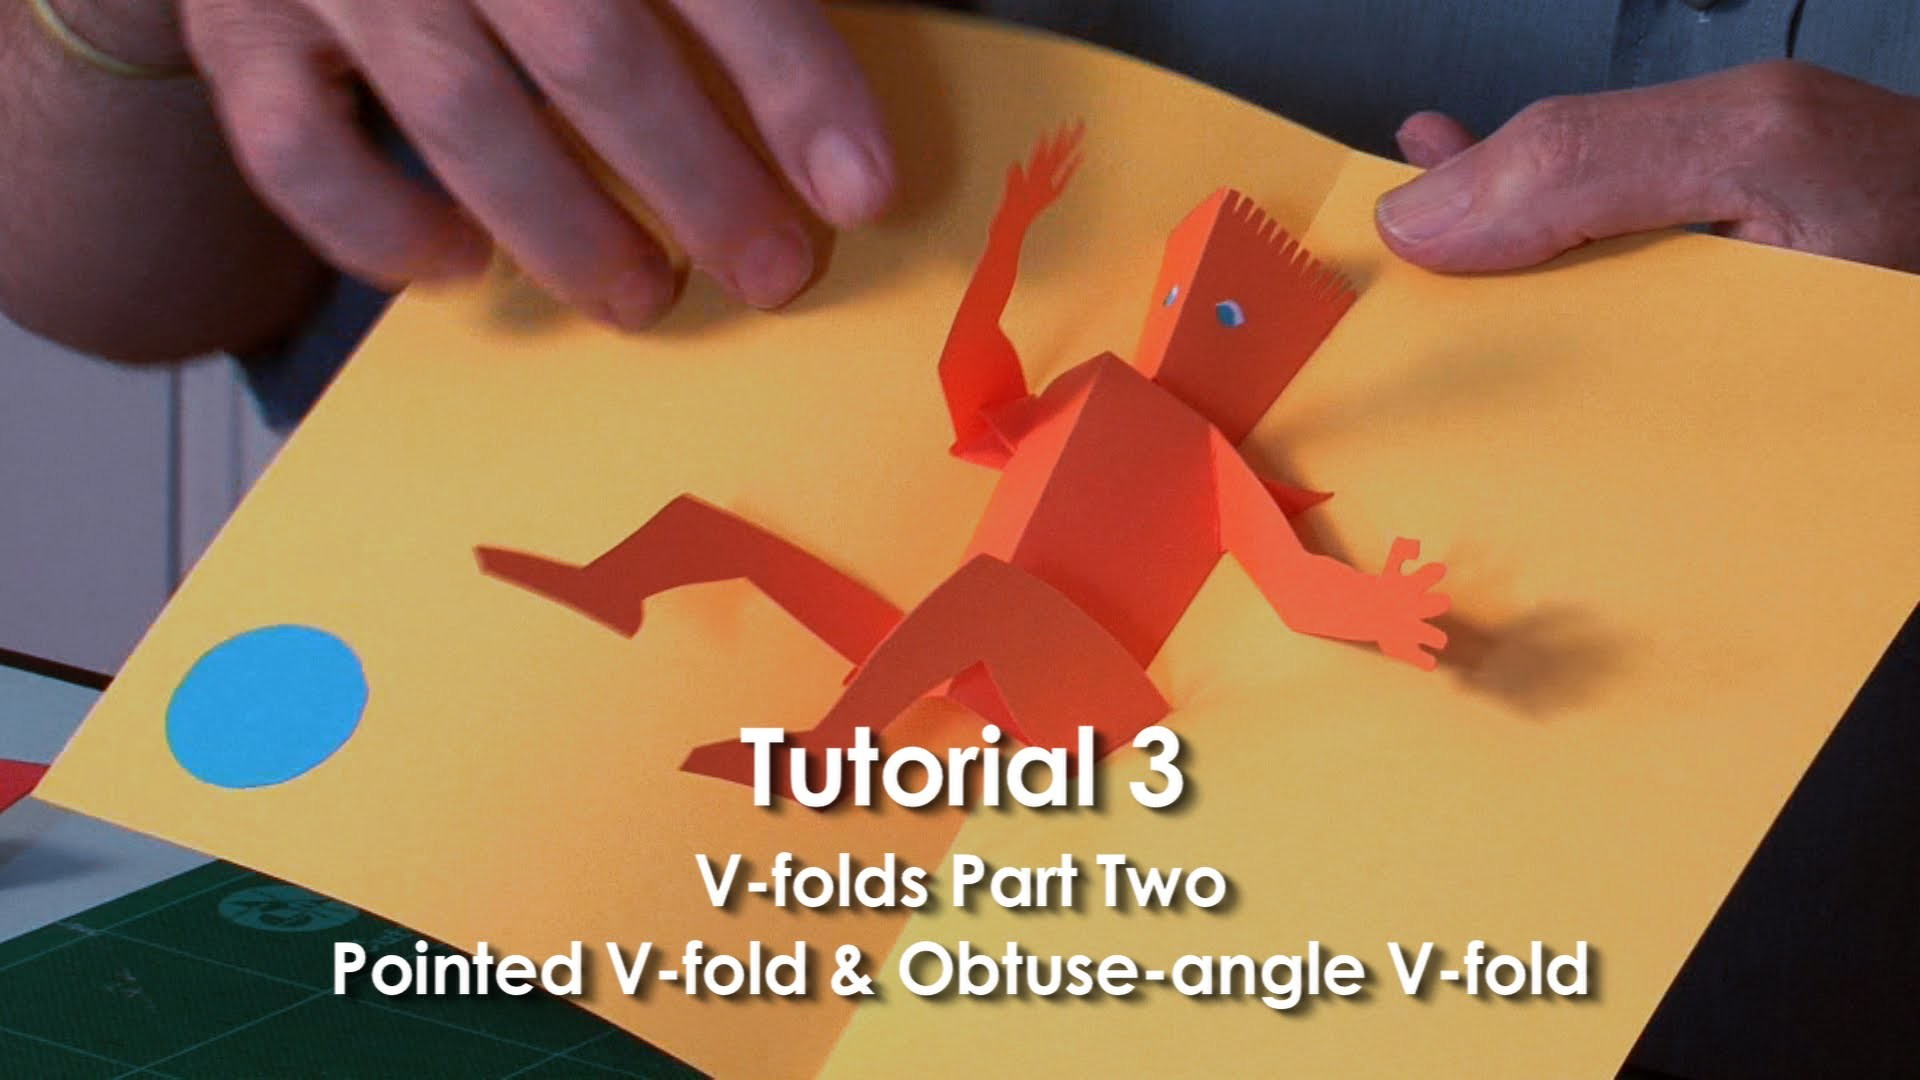 Tutorial 3 - V-folds Part 2 Pointed V-fold & Obtuse-angle V-fold